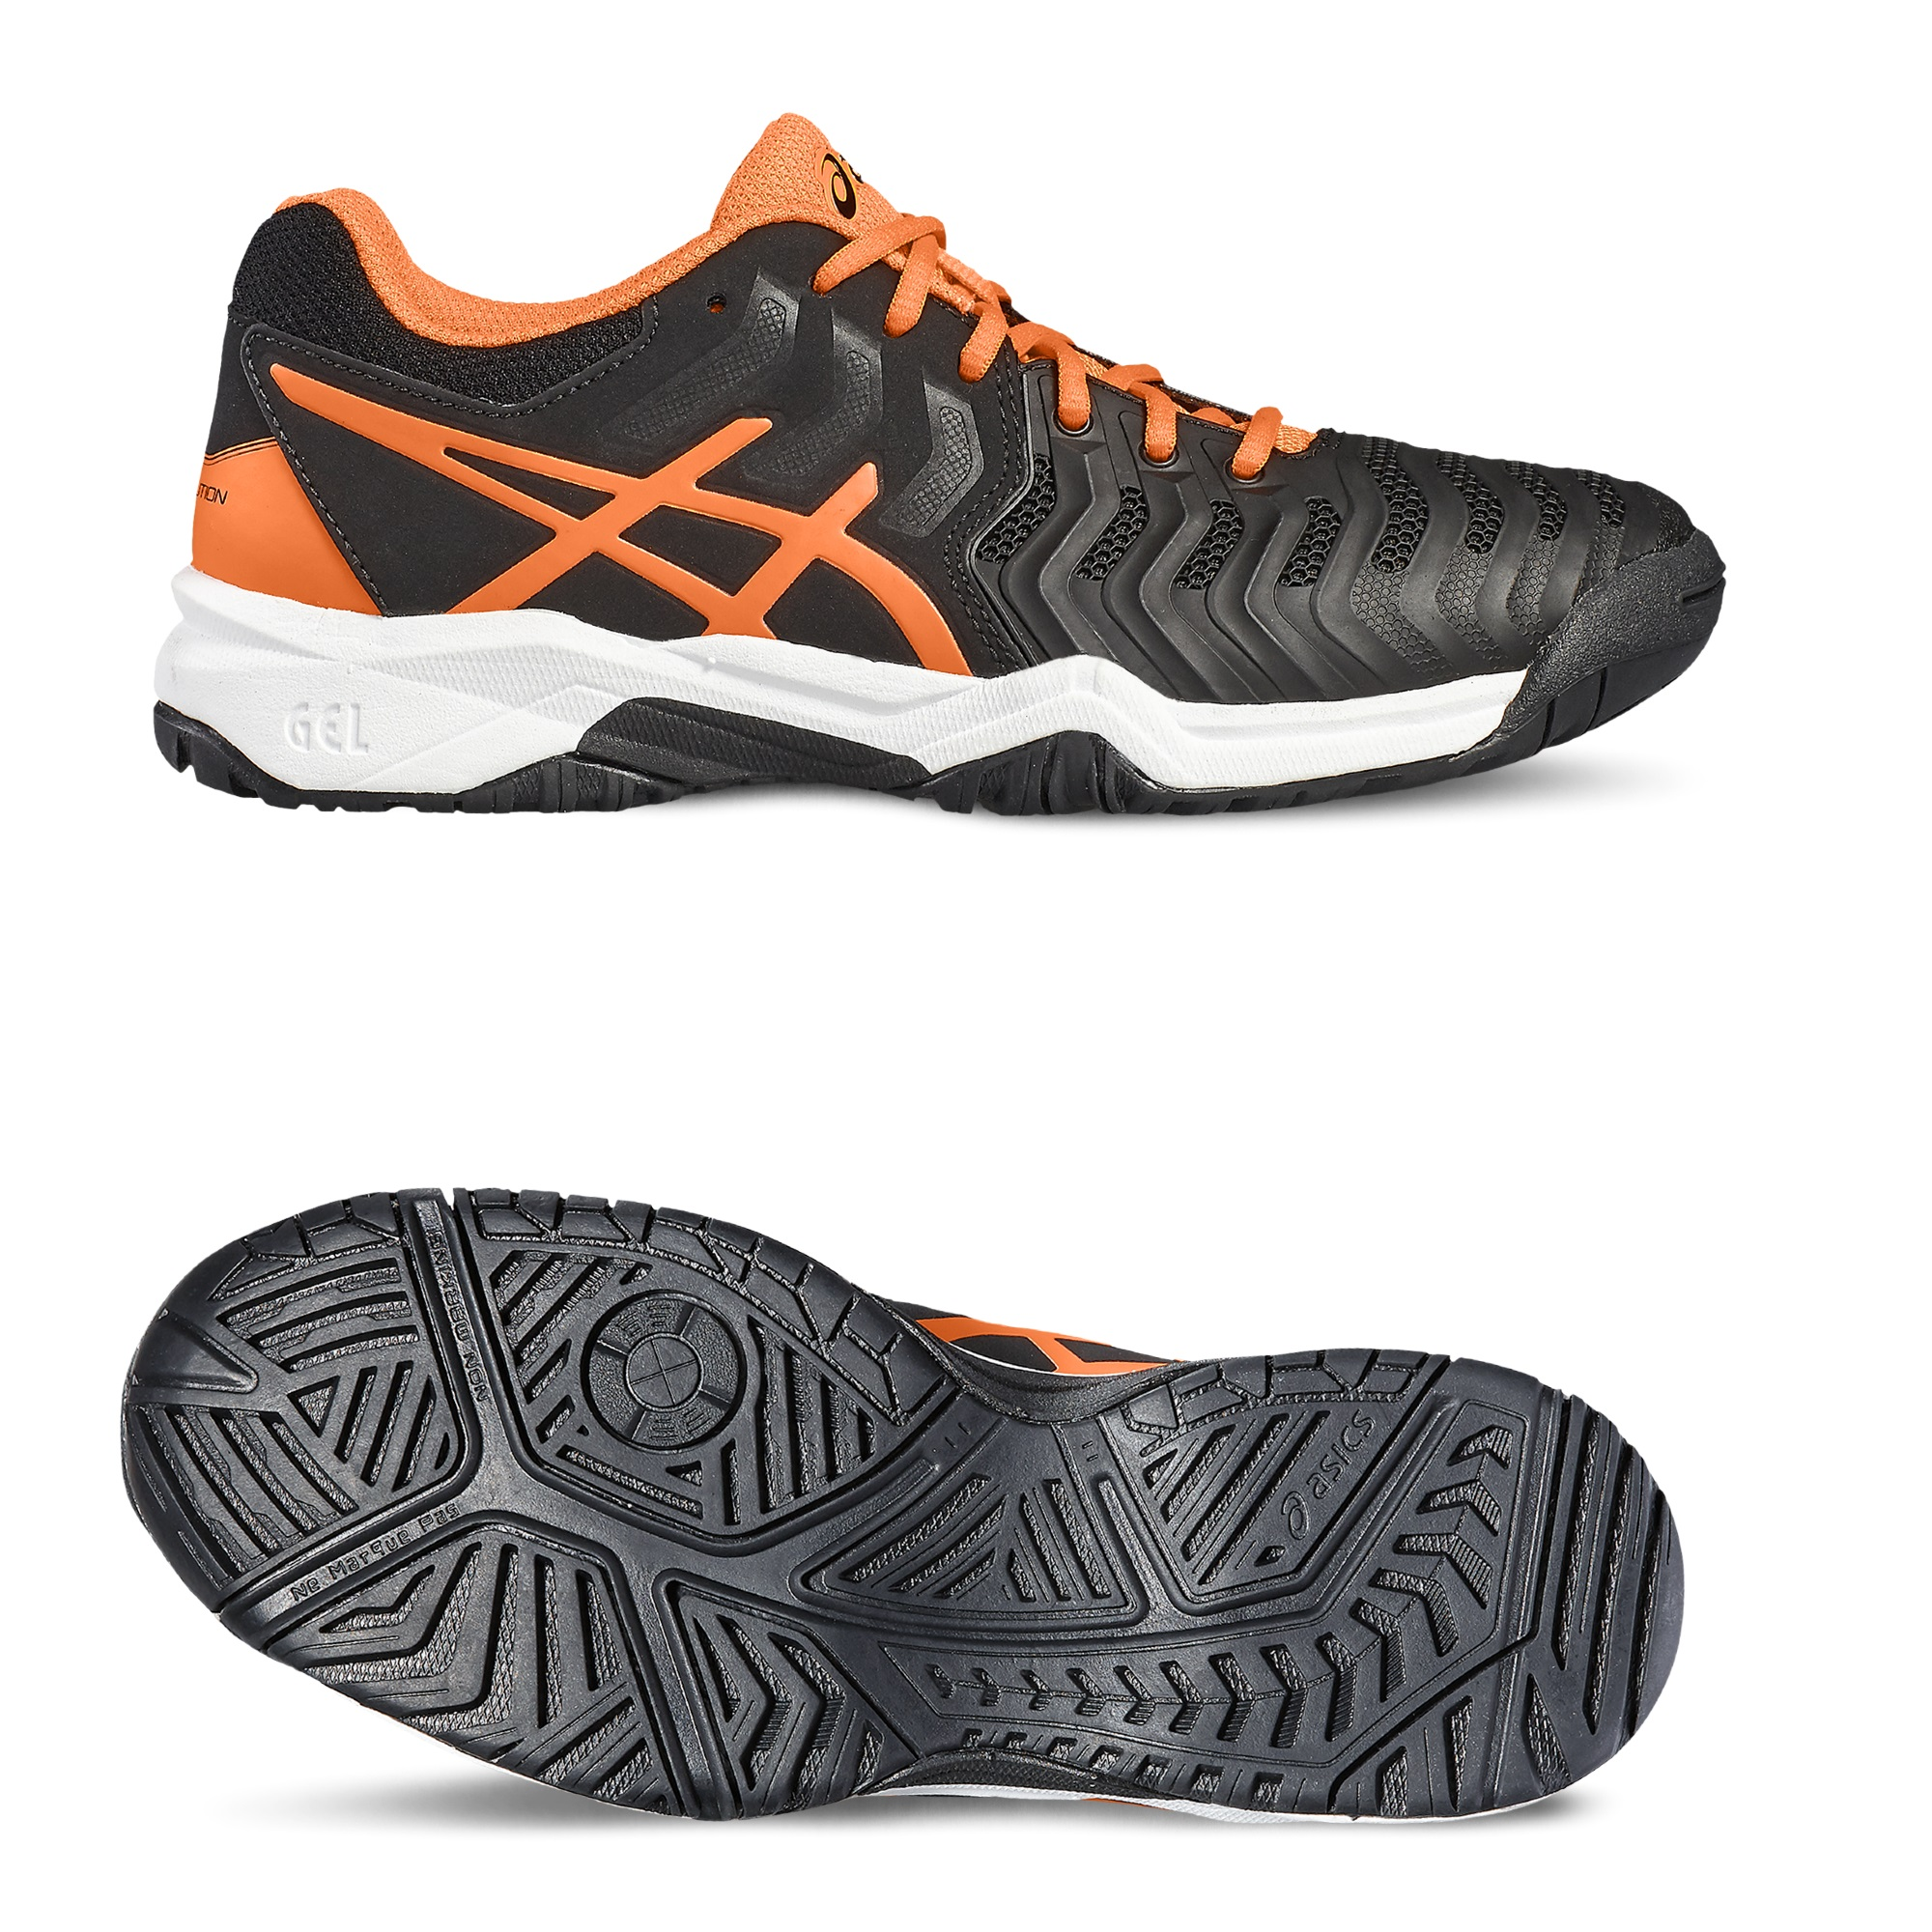 Asics GelResolution 7 GS Boys Tennis Shoes  1 UK